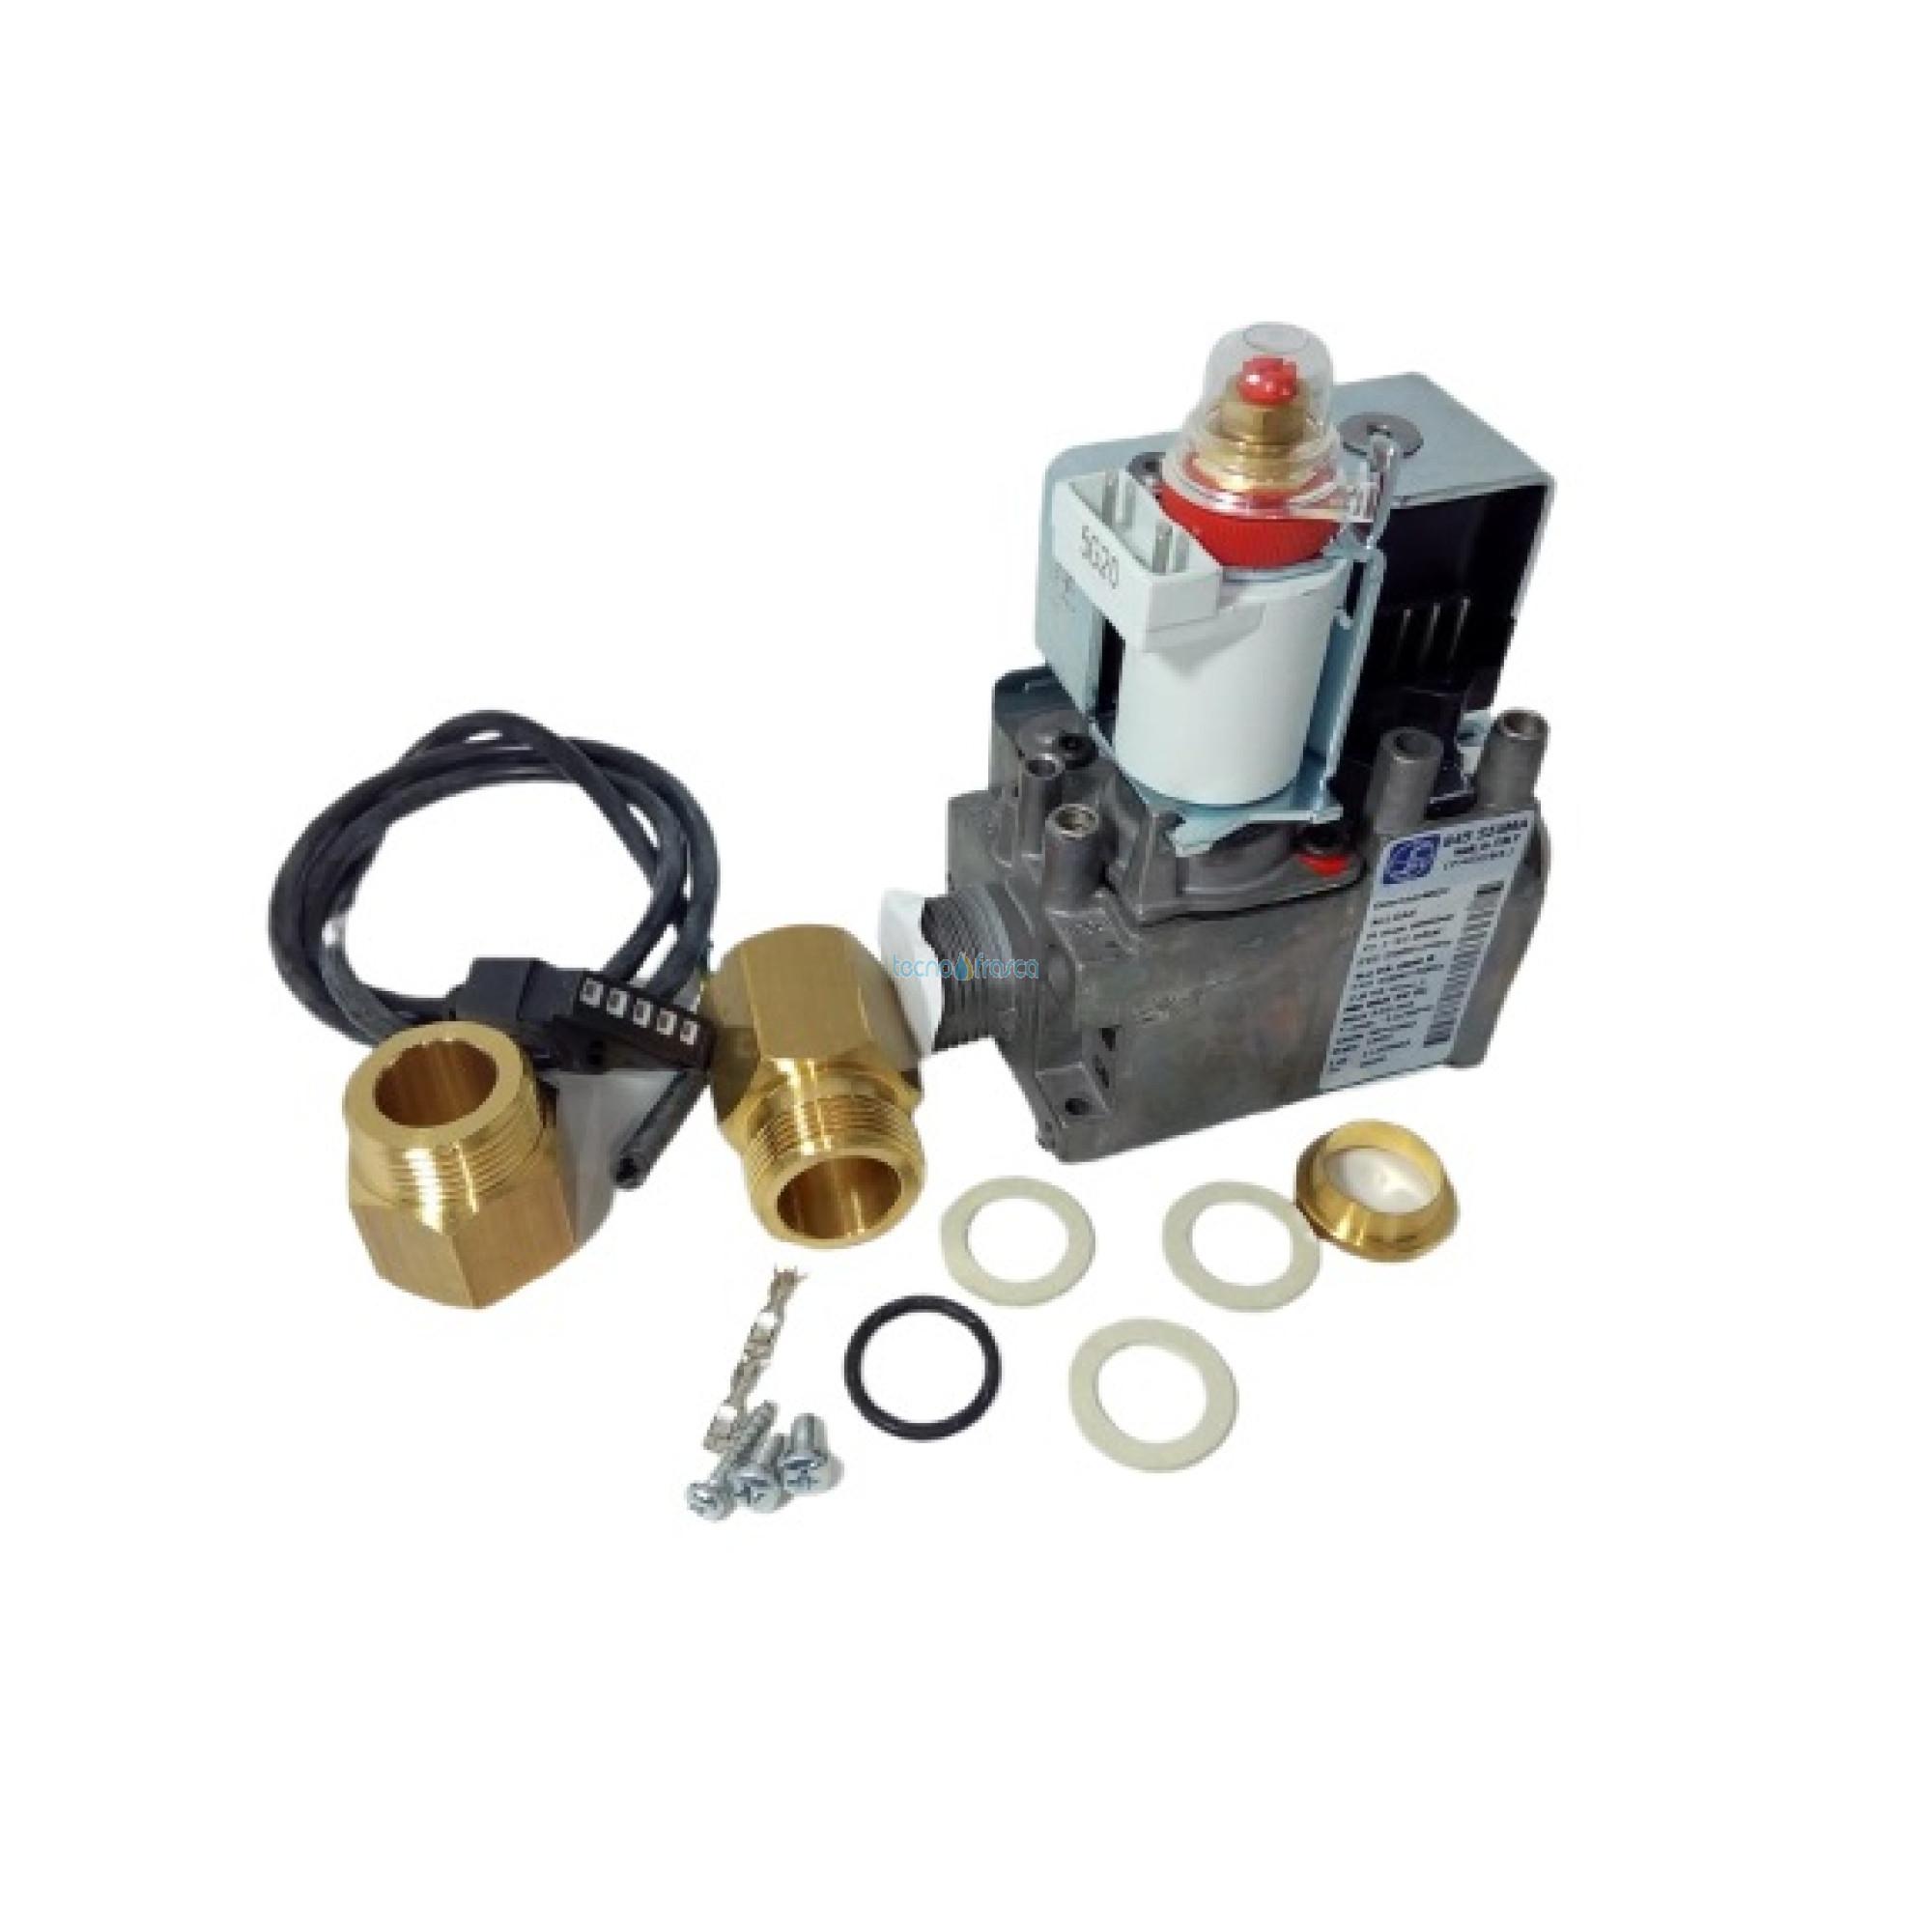 Immergas kit valvola gas 845 accensione rapida 3.015105